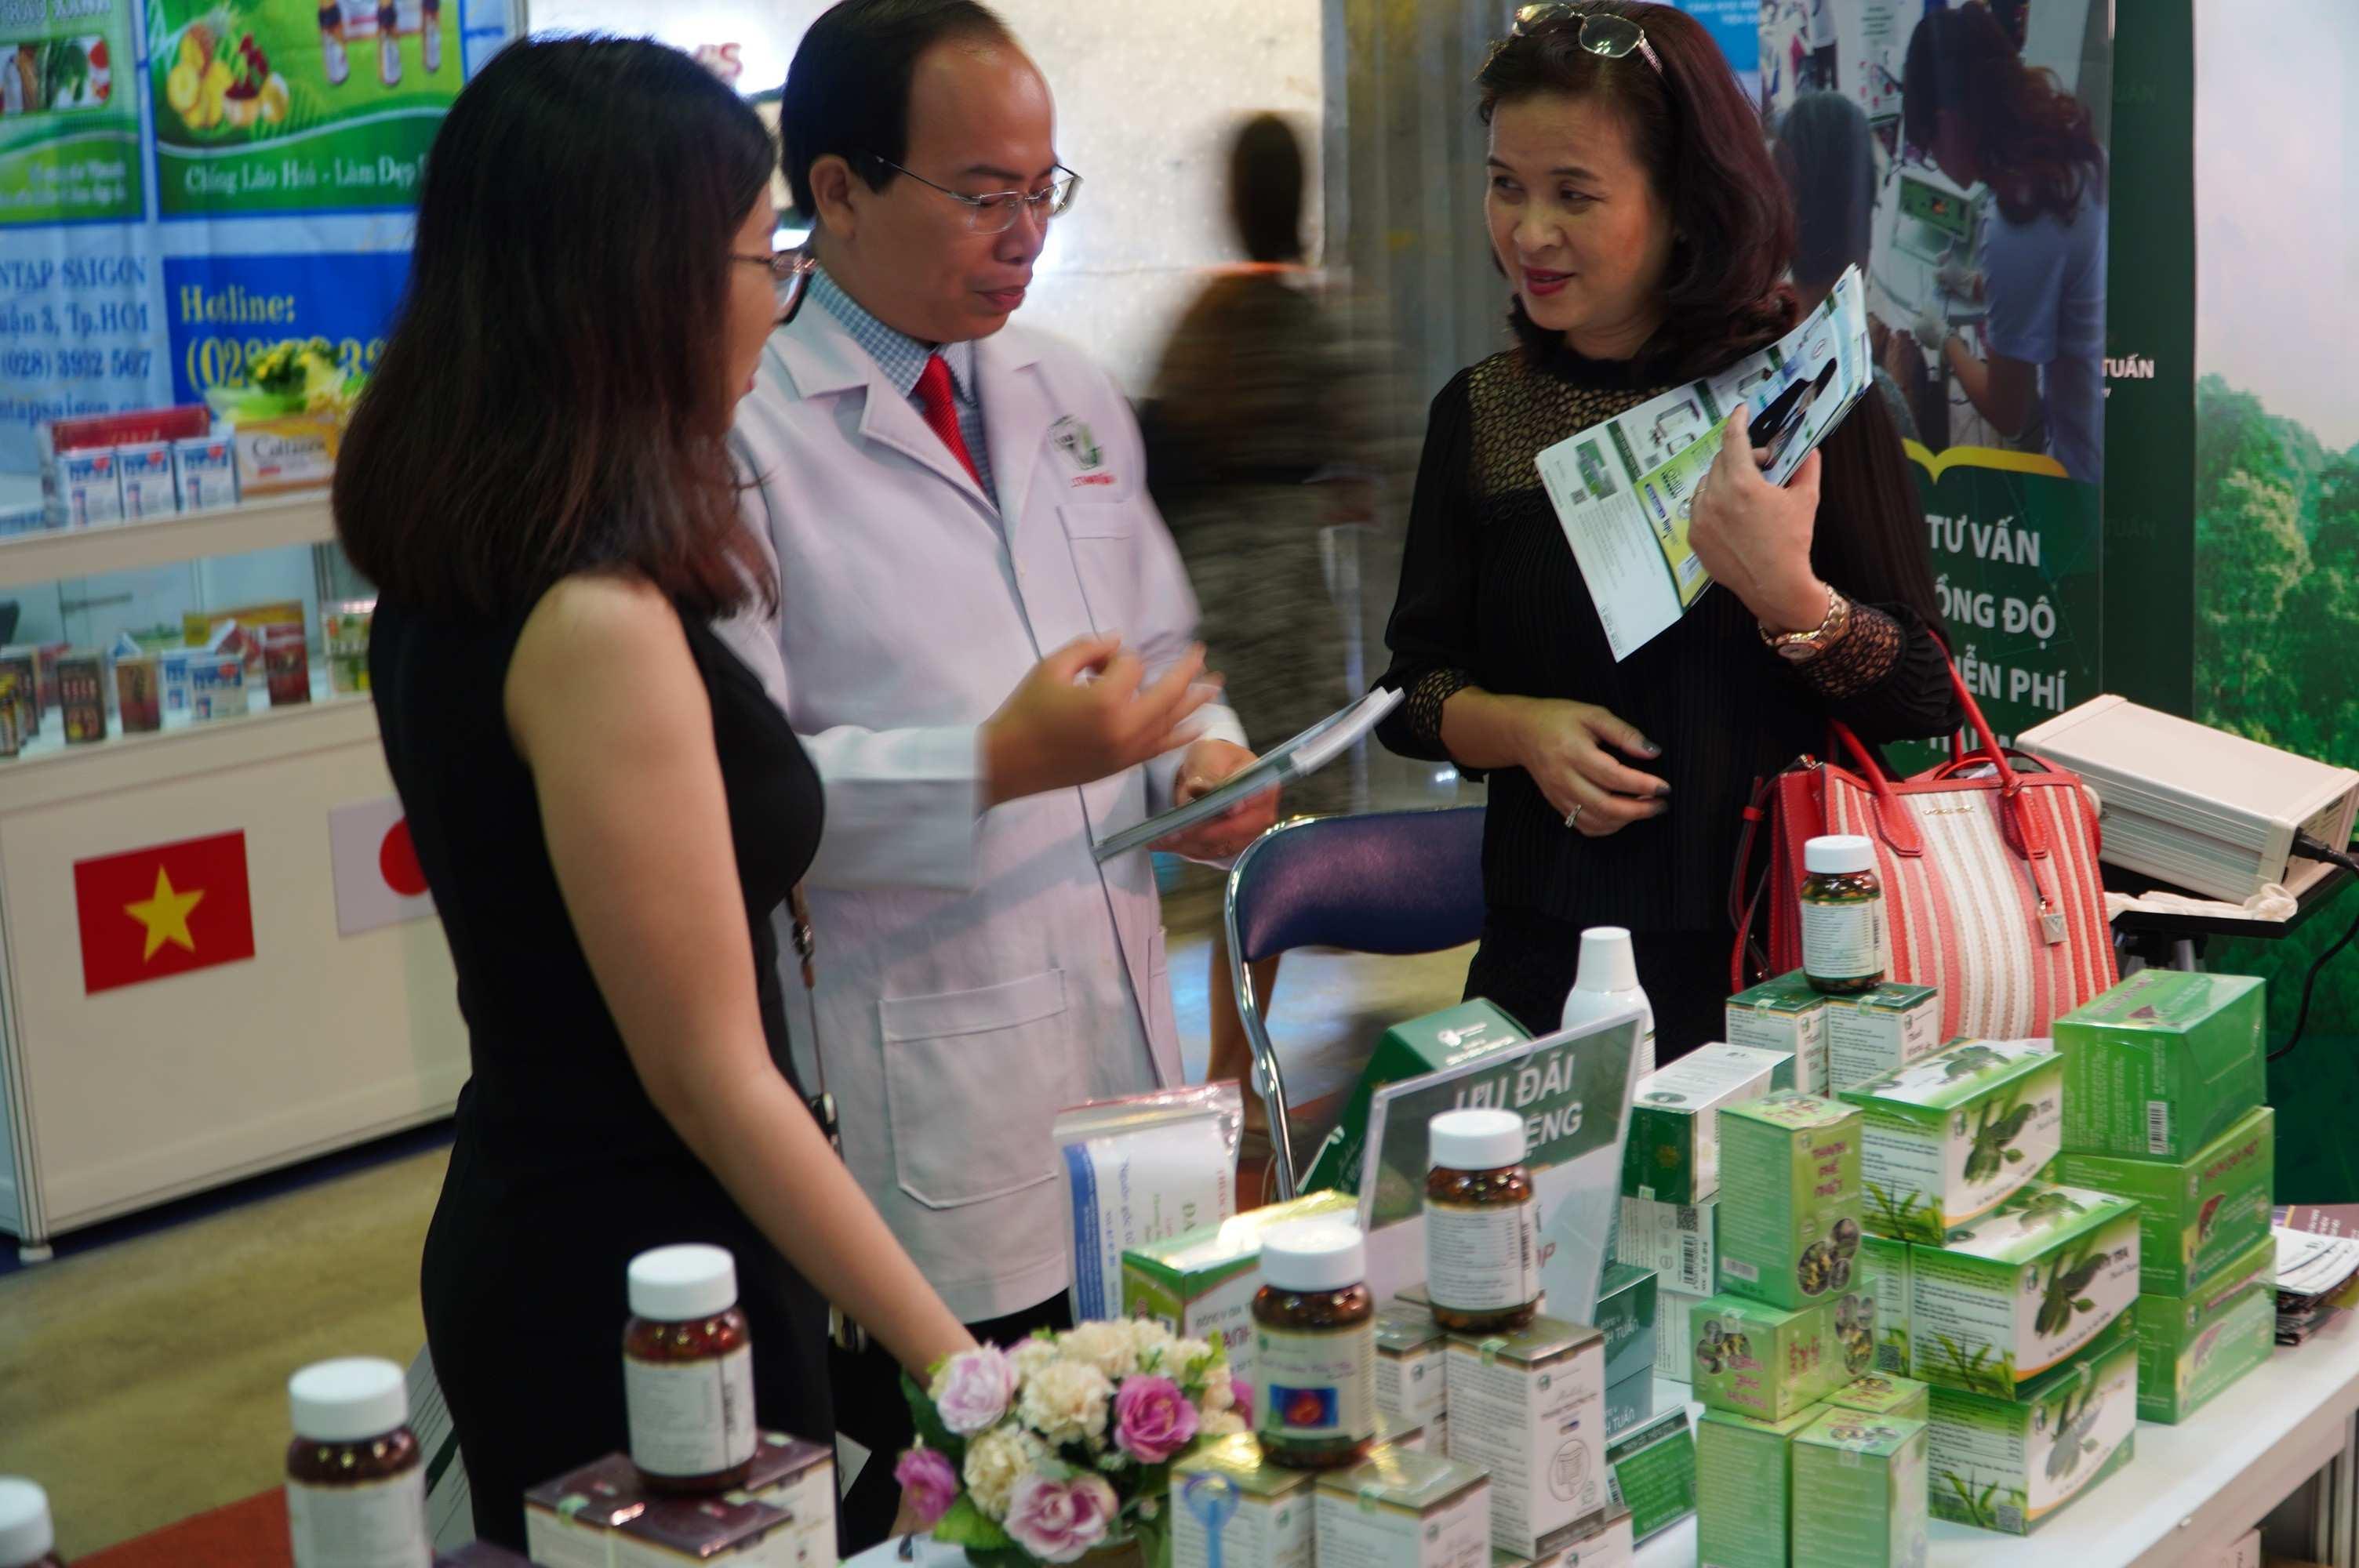 Pharmed & Healthcare Vietnam (Pharmedi 2019): Pharmaceutical companies come to Pharmedi 2019 seeking to open markets